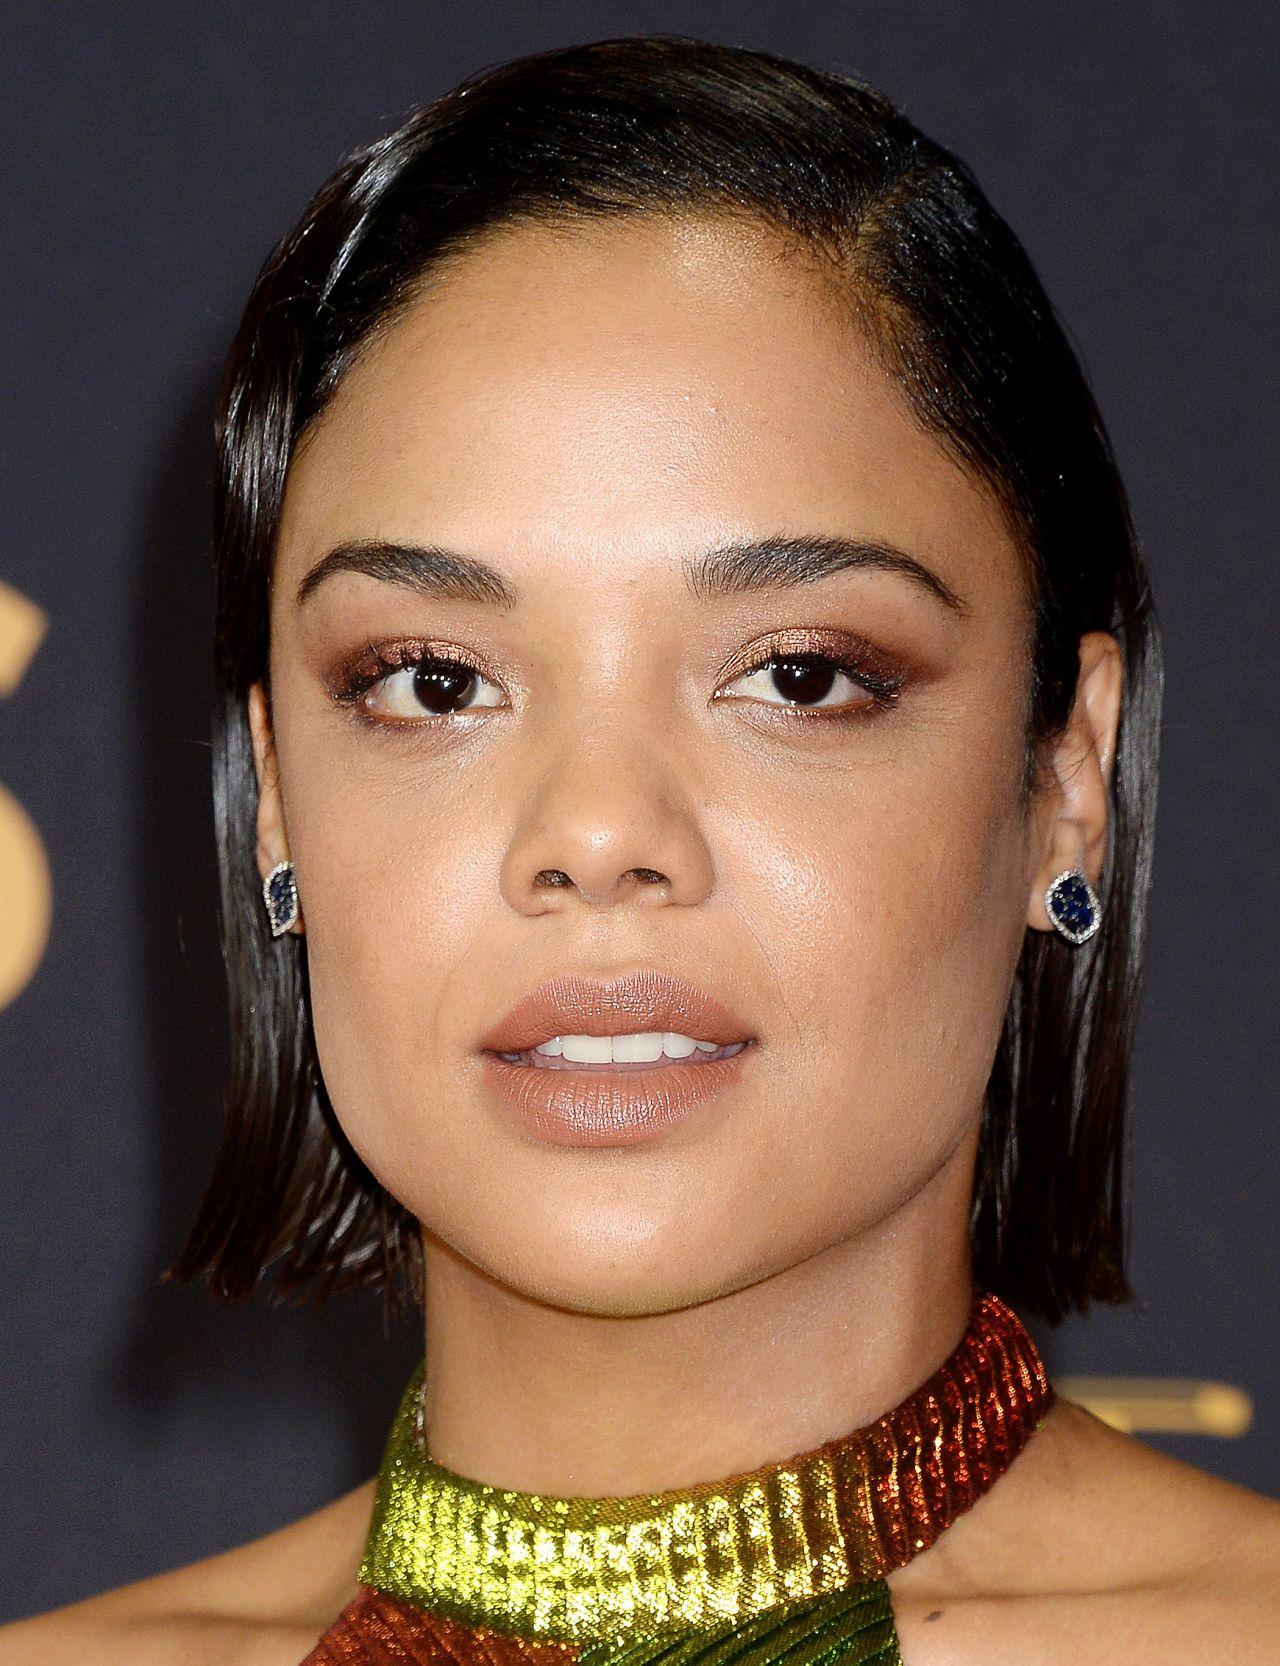 Tessa Thompson Emmy Awards In Los Angeles 09 17 2017